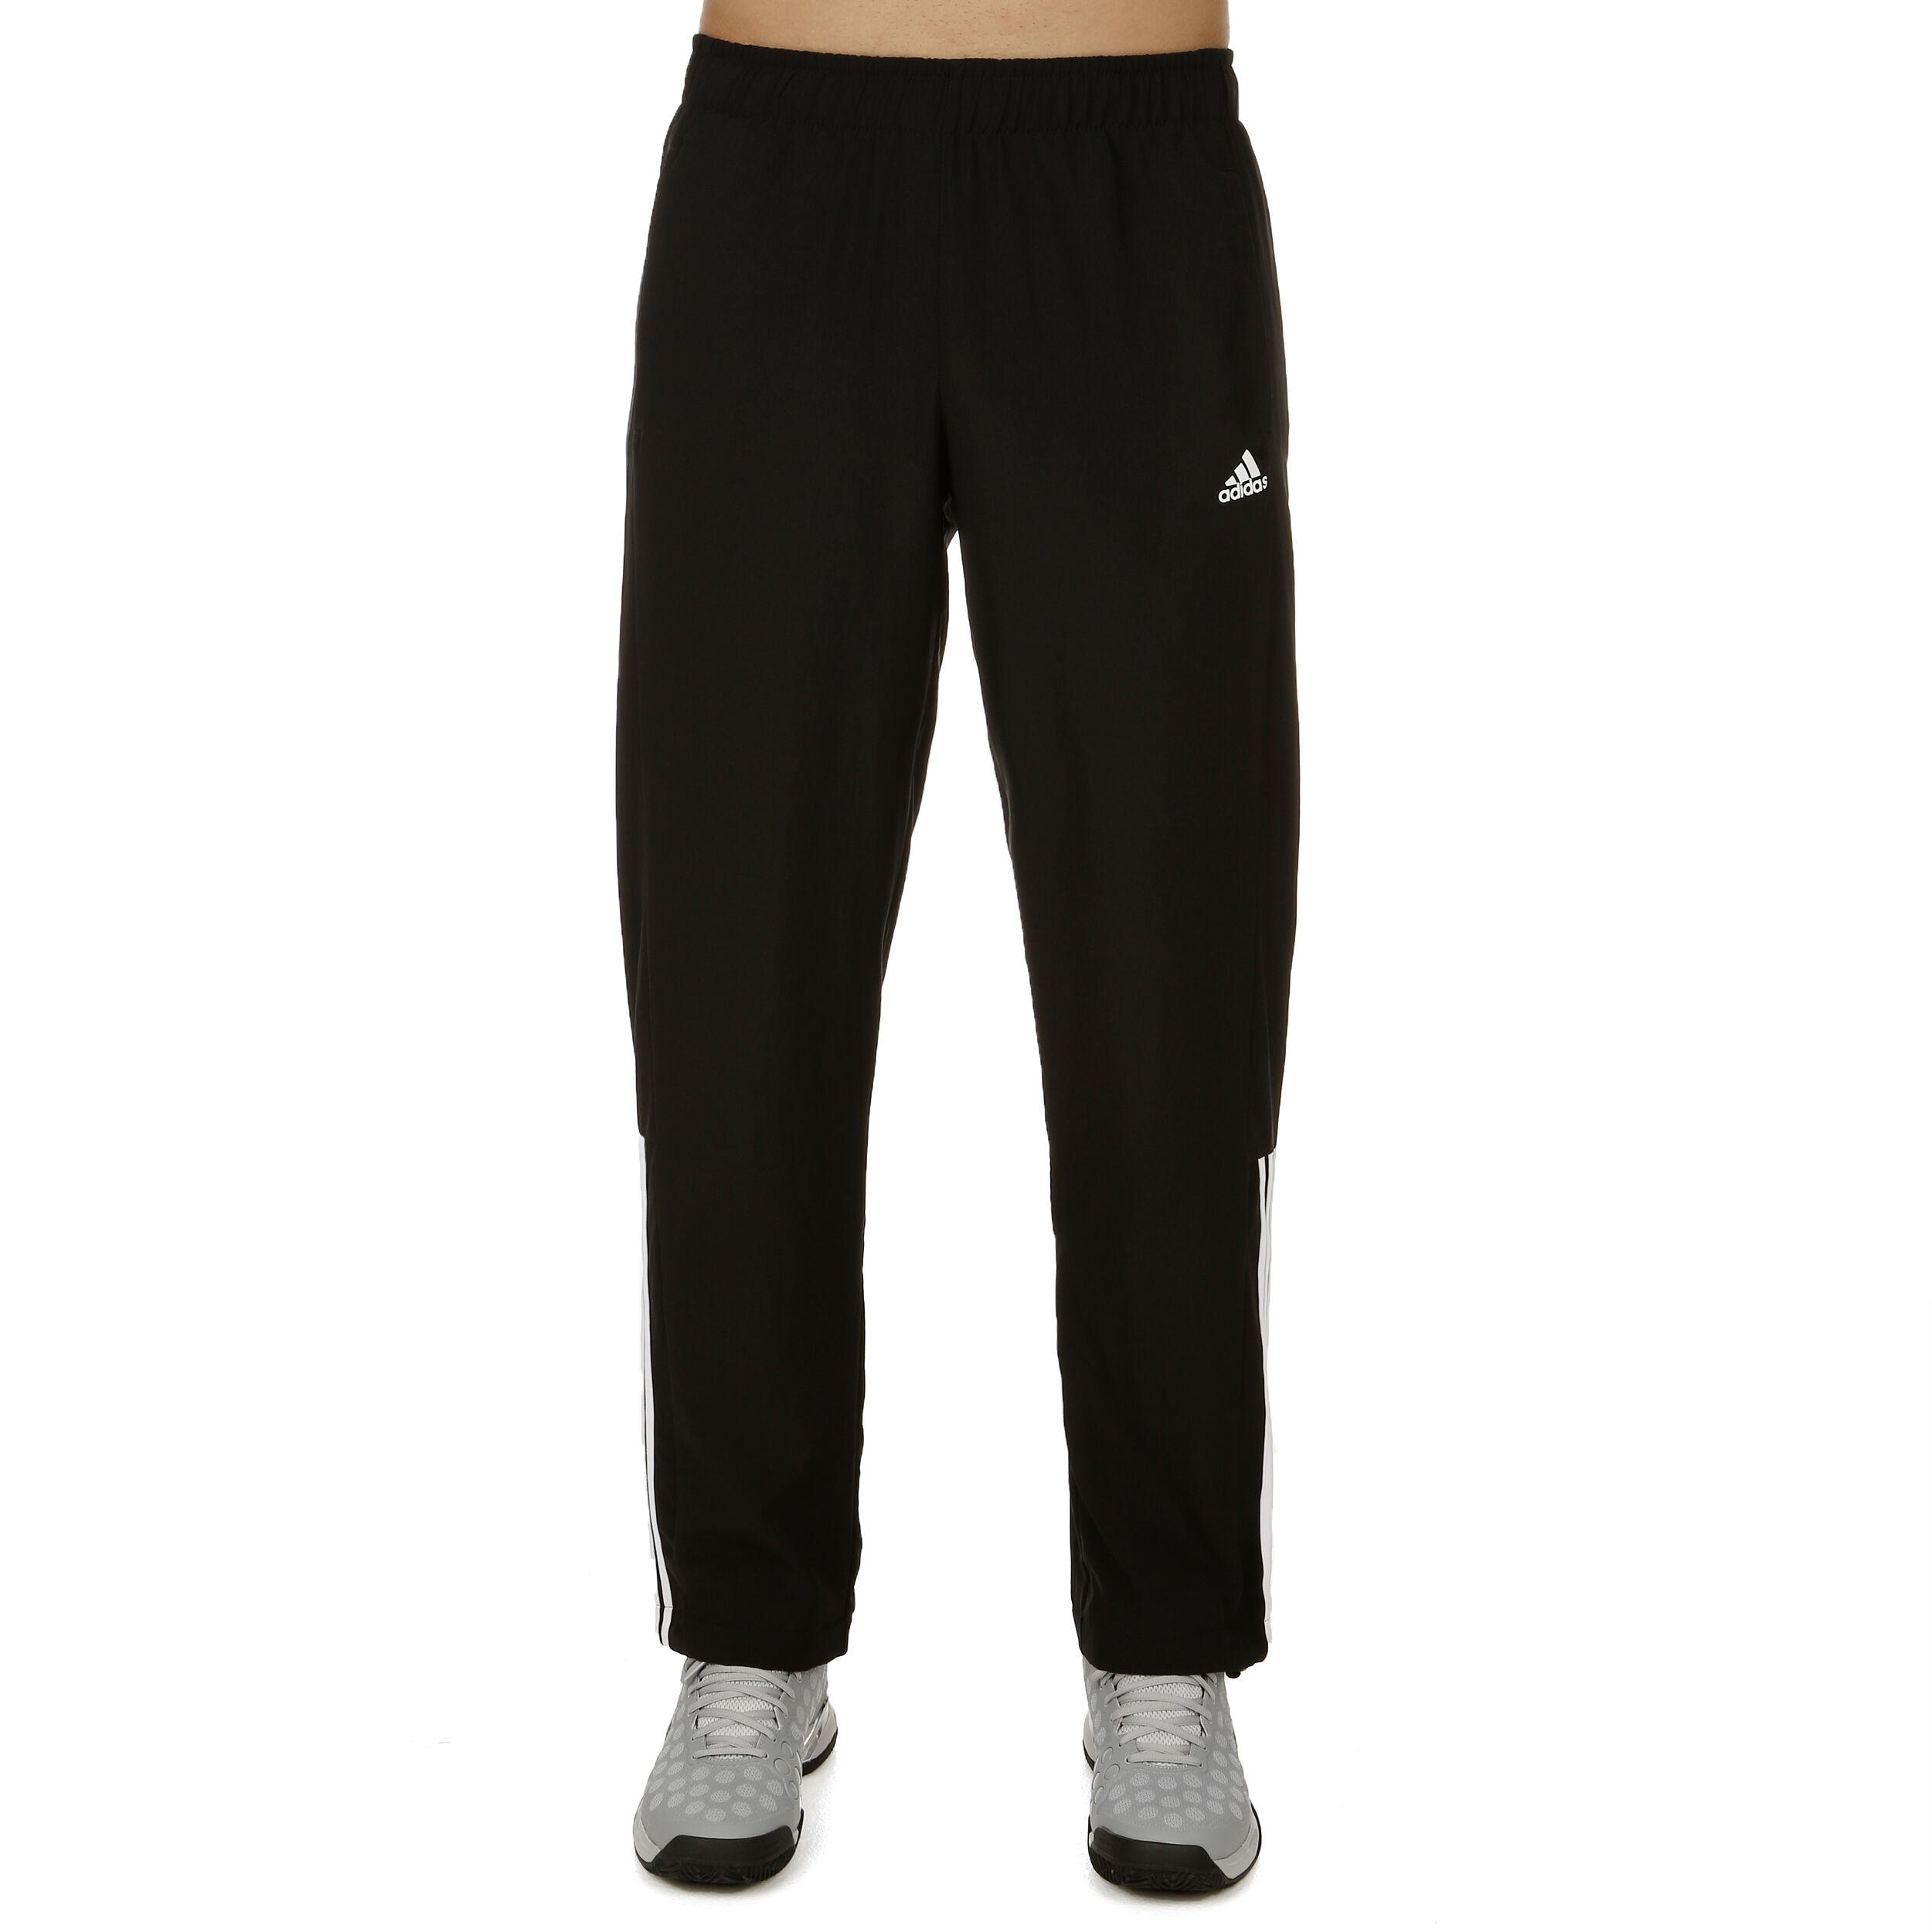 adidas Essentials 3 Stripes Mid Woven Trainingshose Herren